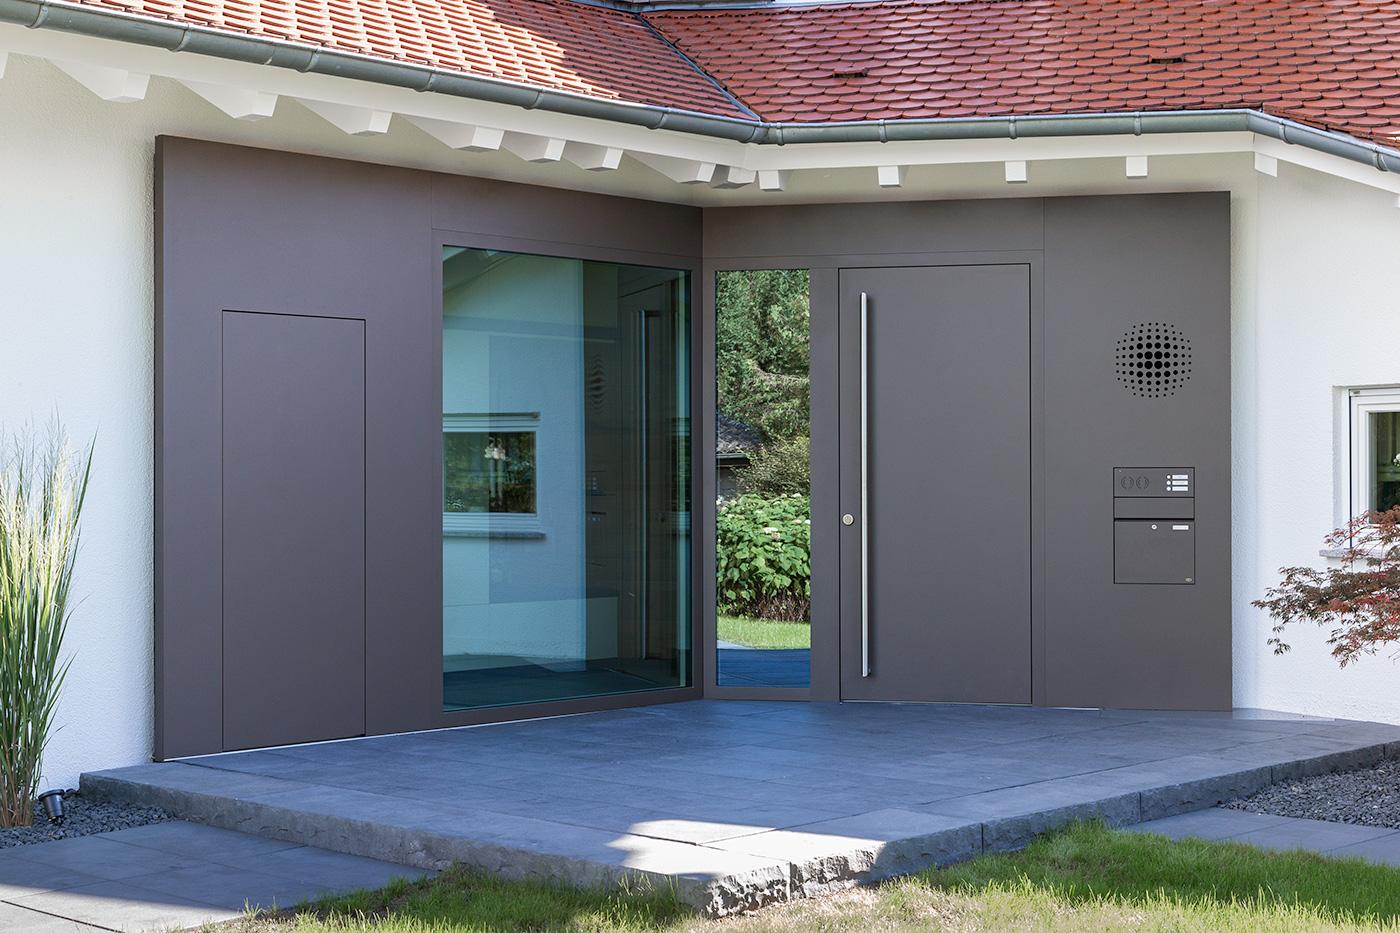 Holz-Aluminium Haustürelement mit Edelstahlstoßgriff